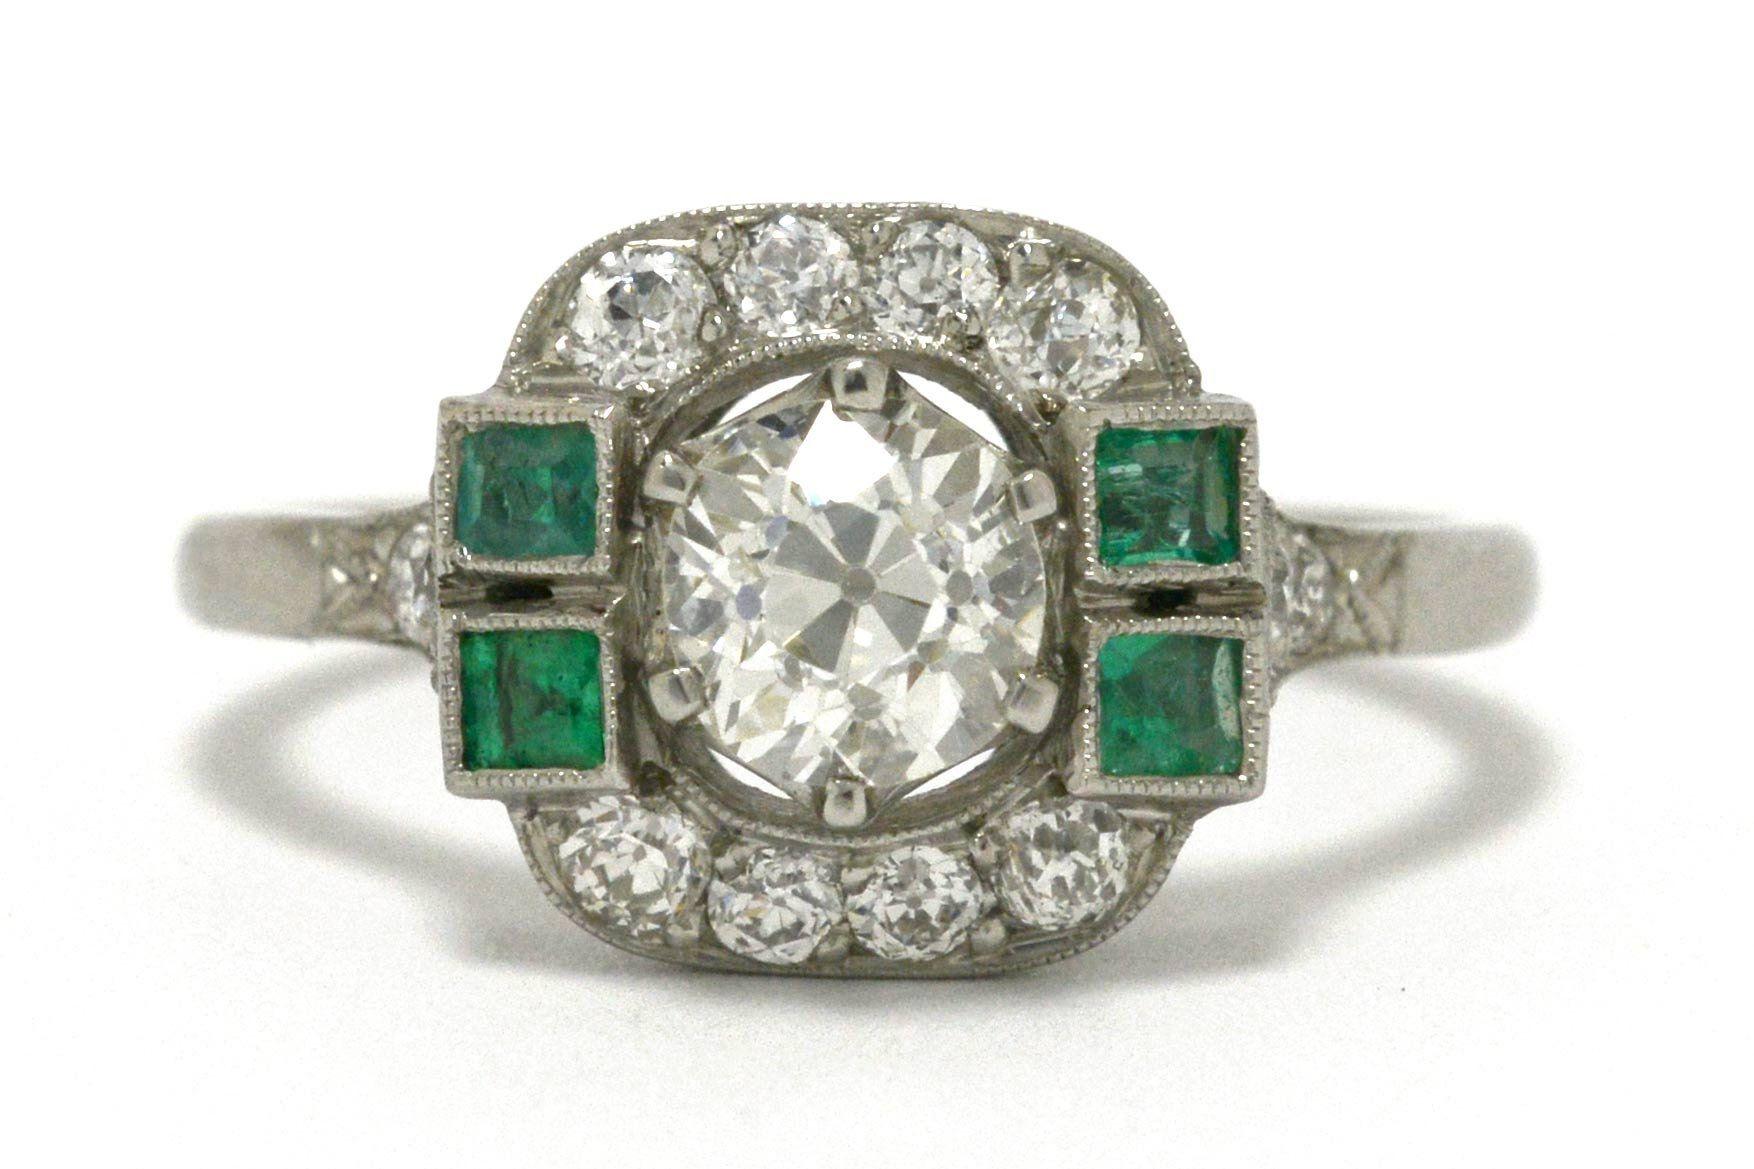 Vintage Old Mine Diamond Engagement Ring Emerald Accent Antique Art Deco Platinum Sq Diamond Engagement Rings Vintage Engagement Rings Diamond Engagement Rings